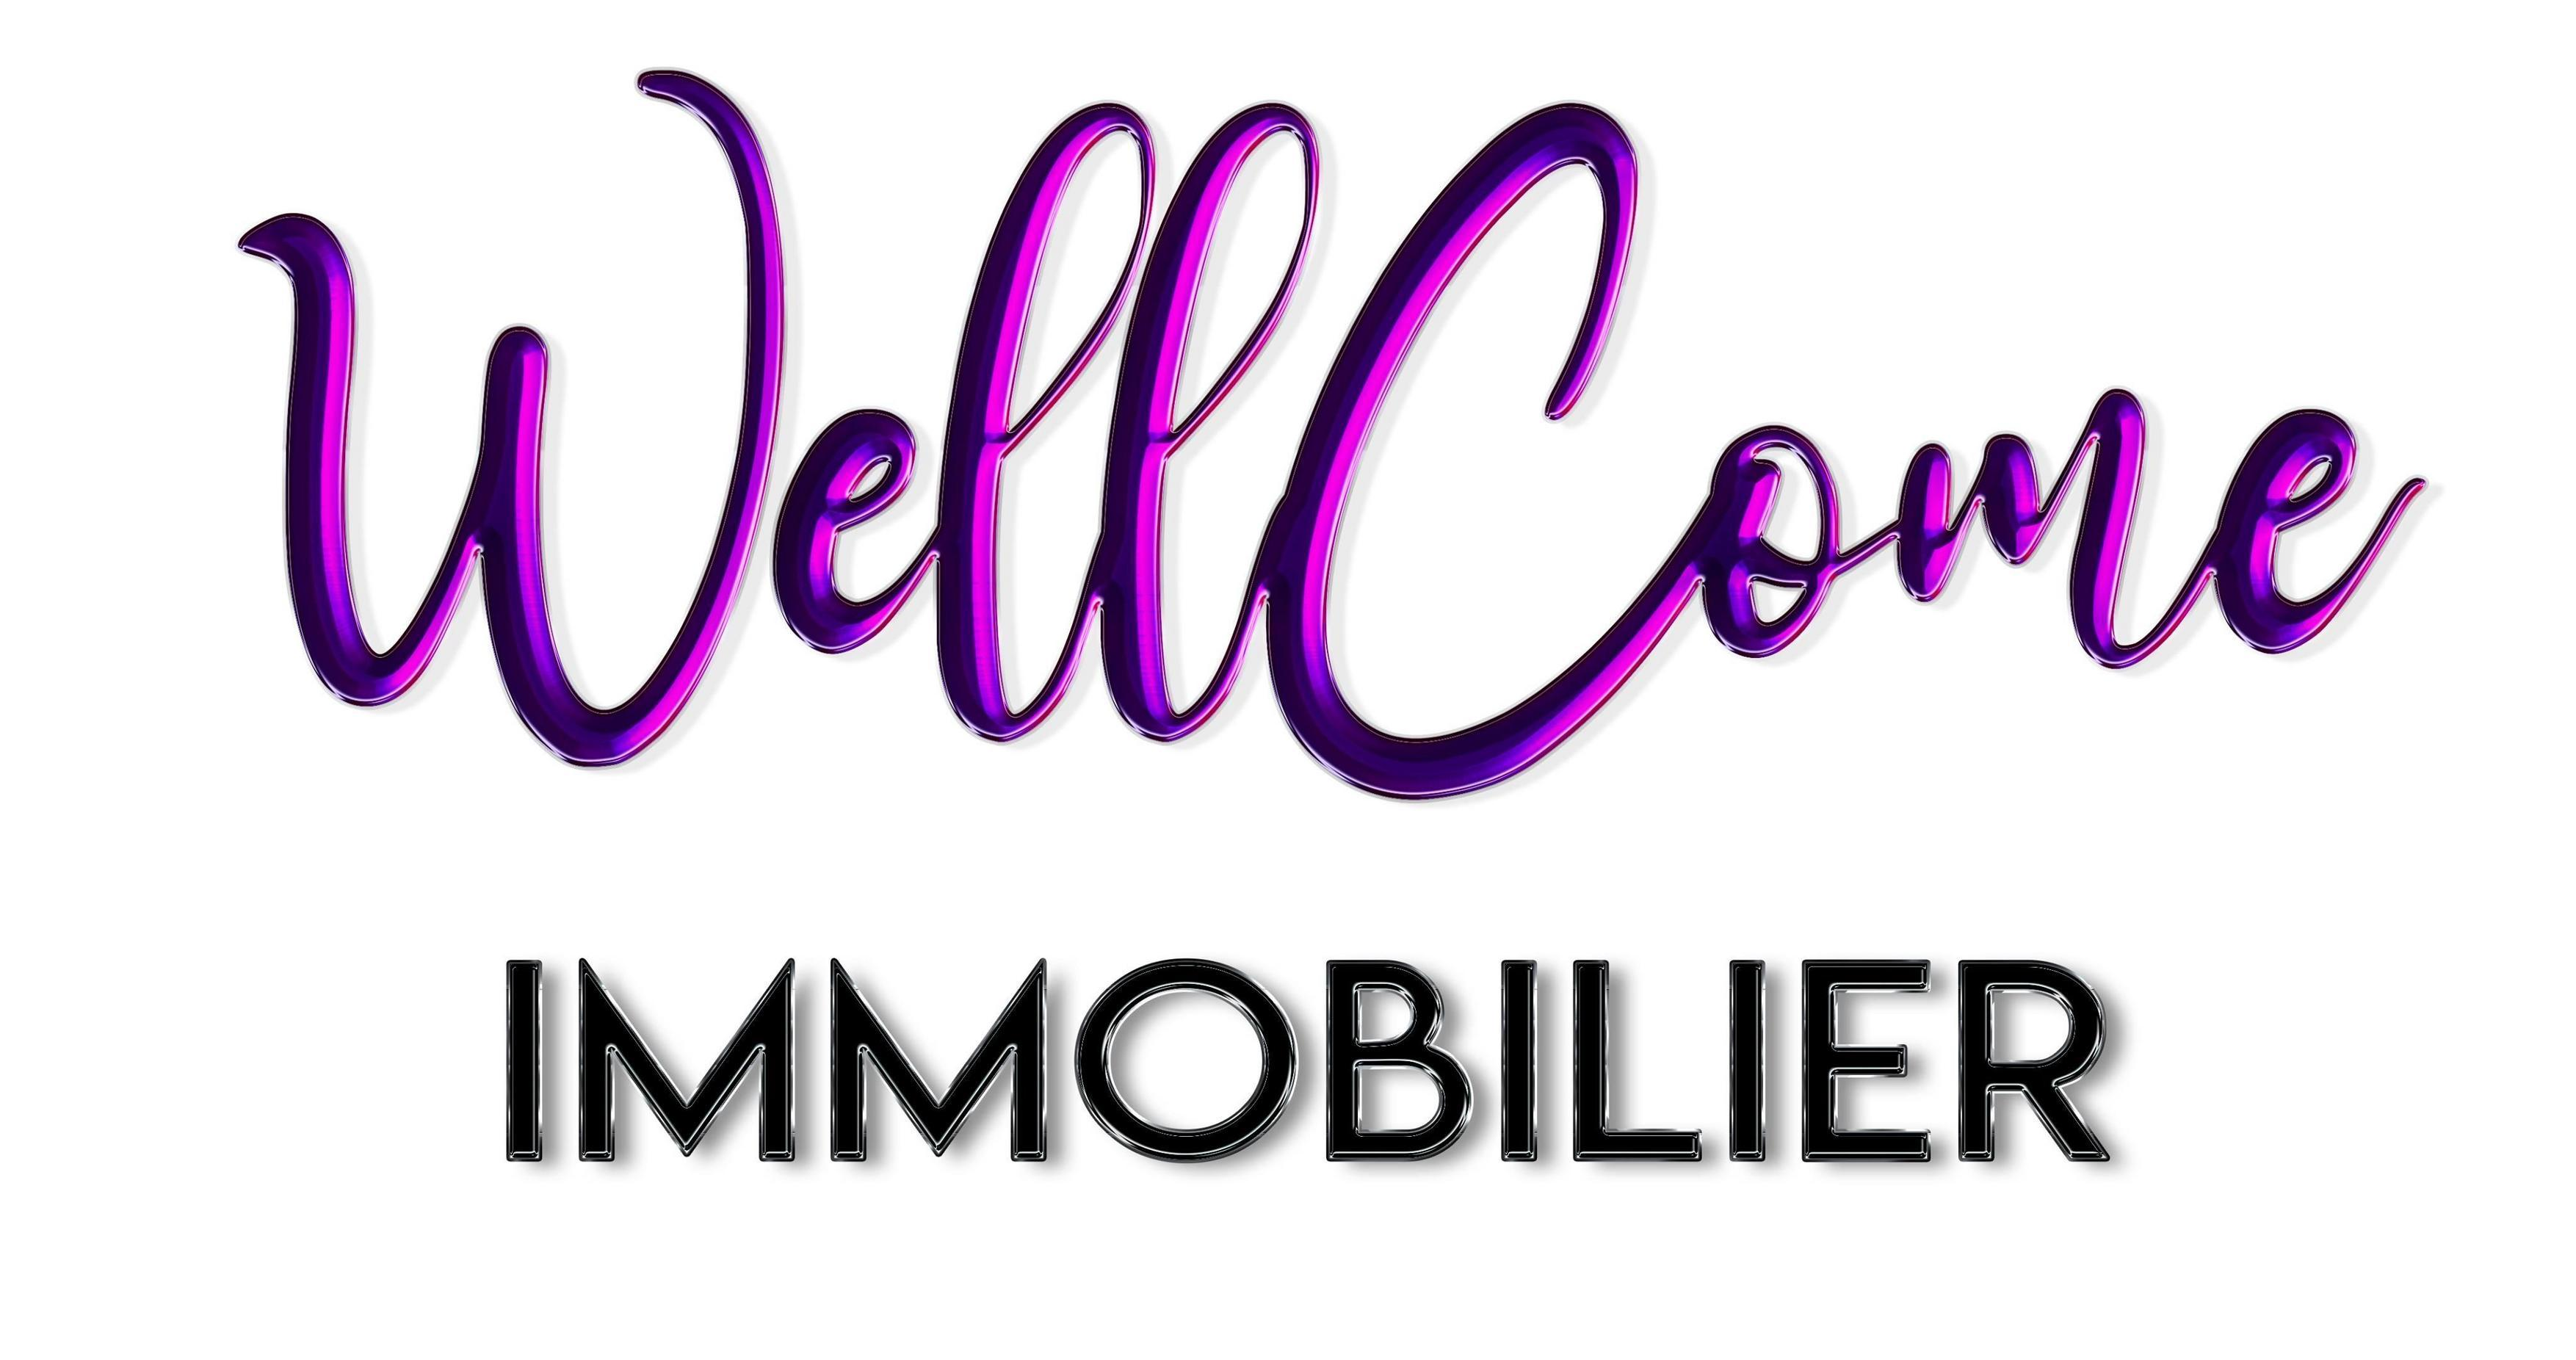 WellCome Immobilier agence immobilière Aix-les-Bains (73100)